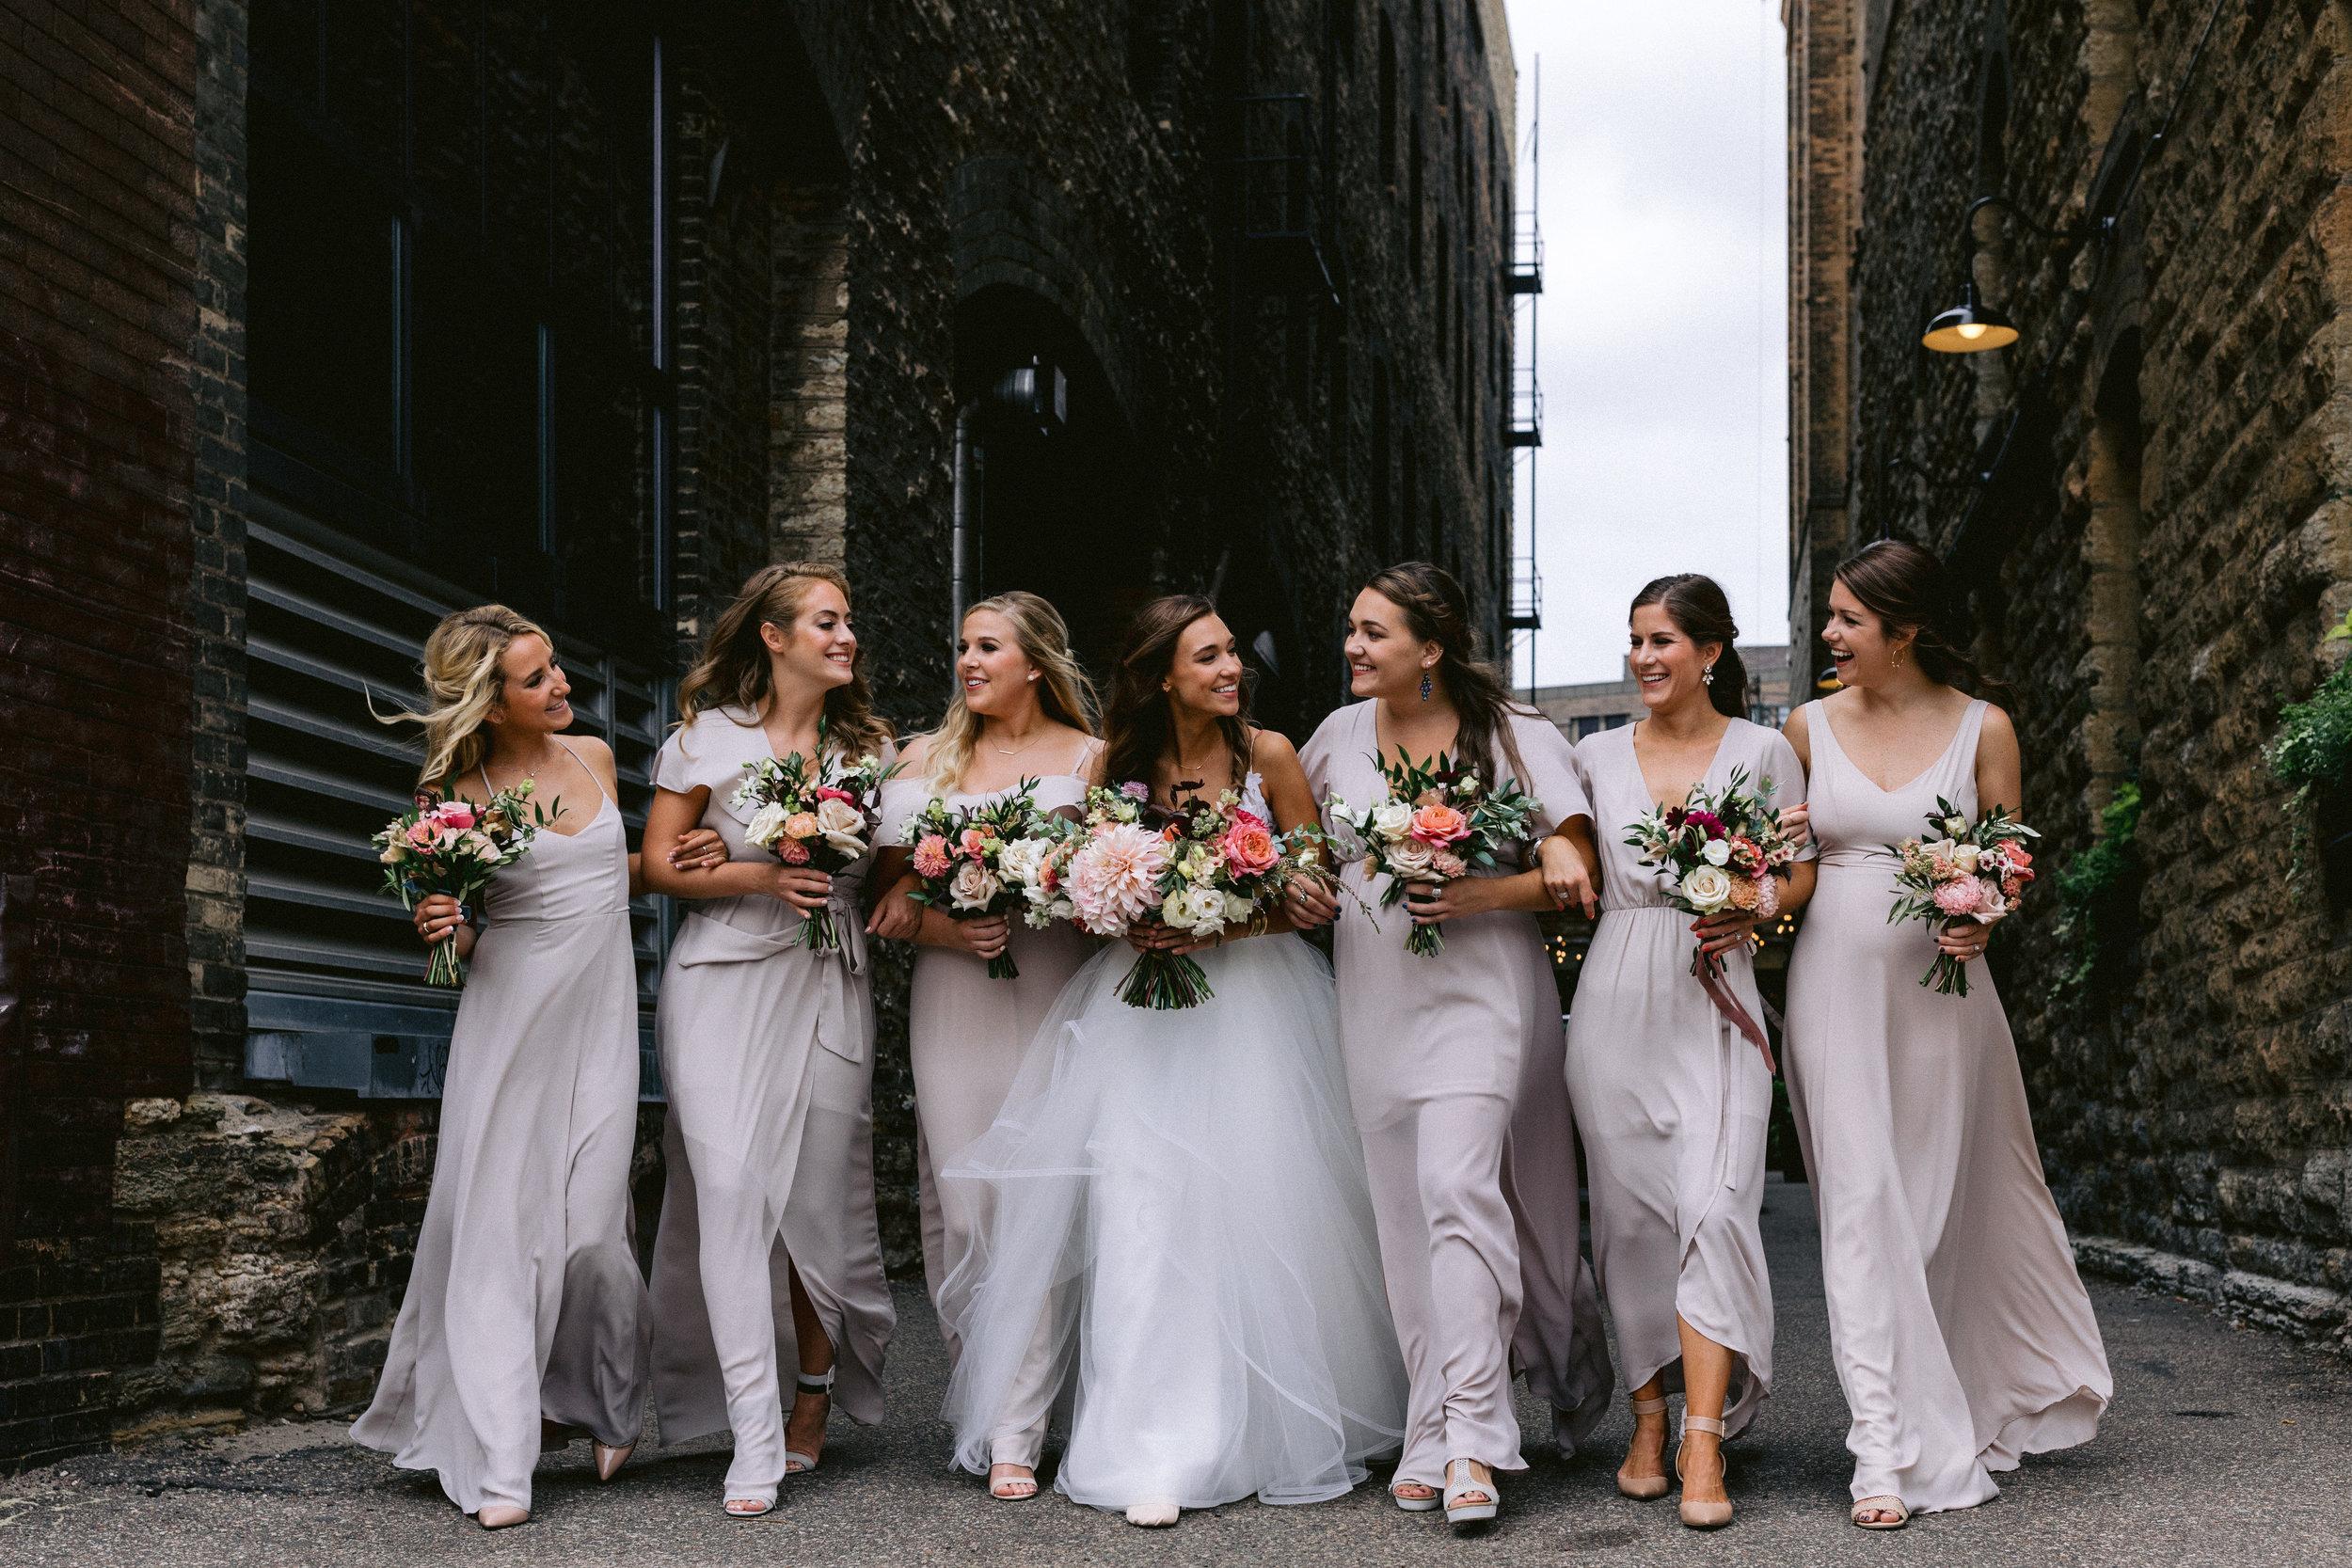 bridesmaids strutting their stuff